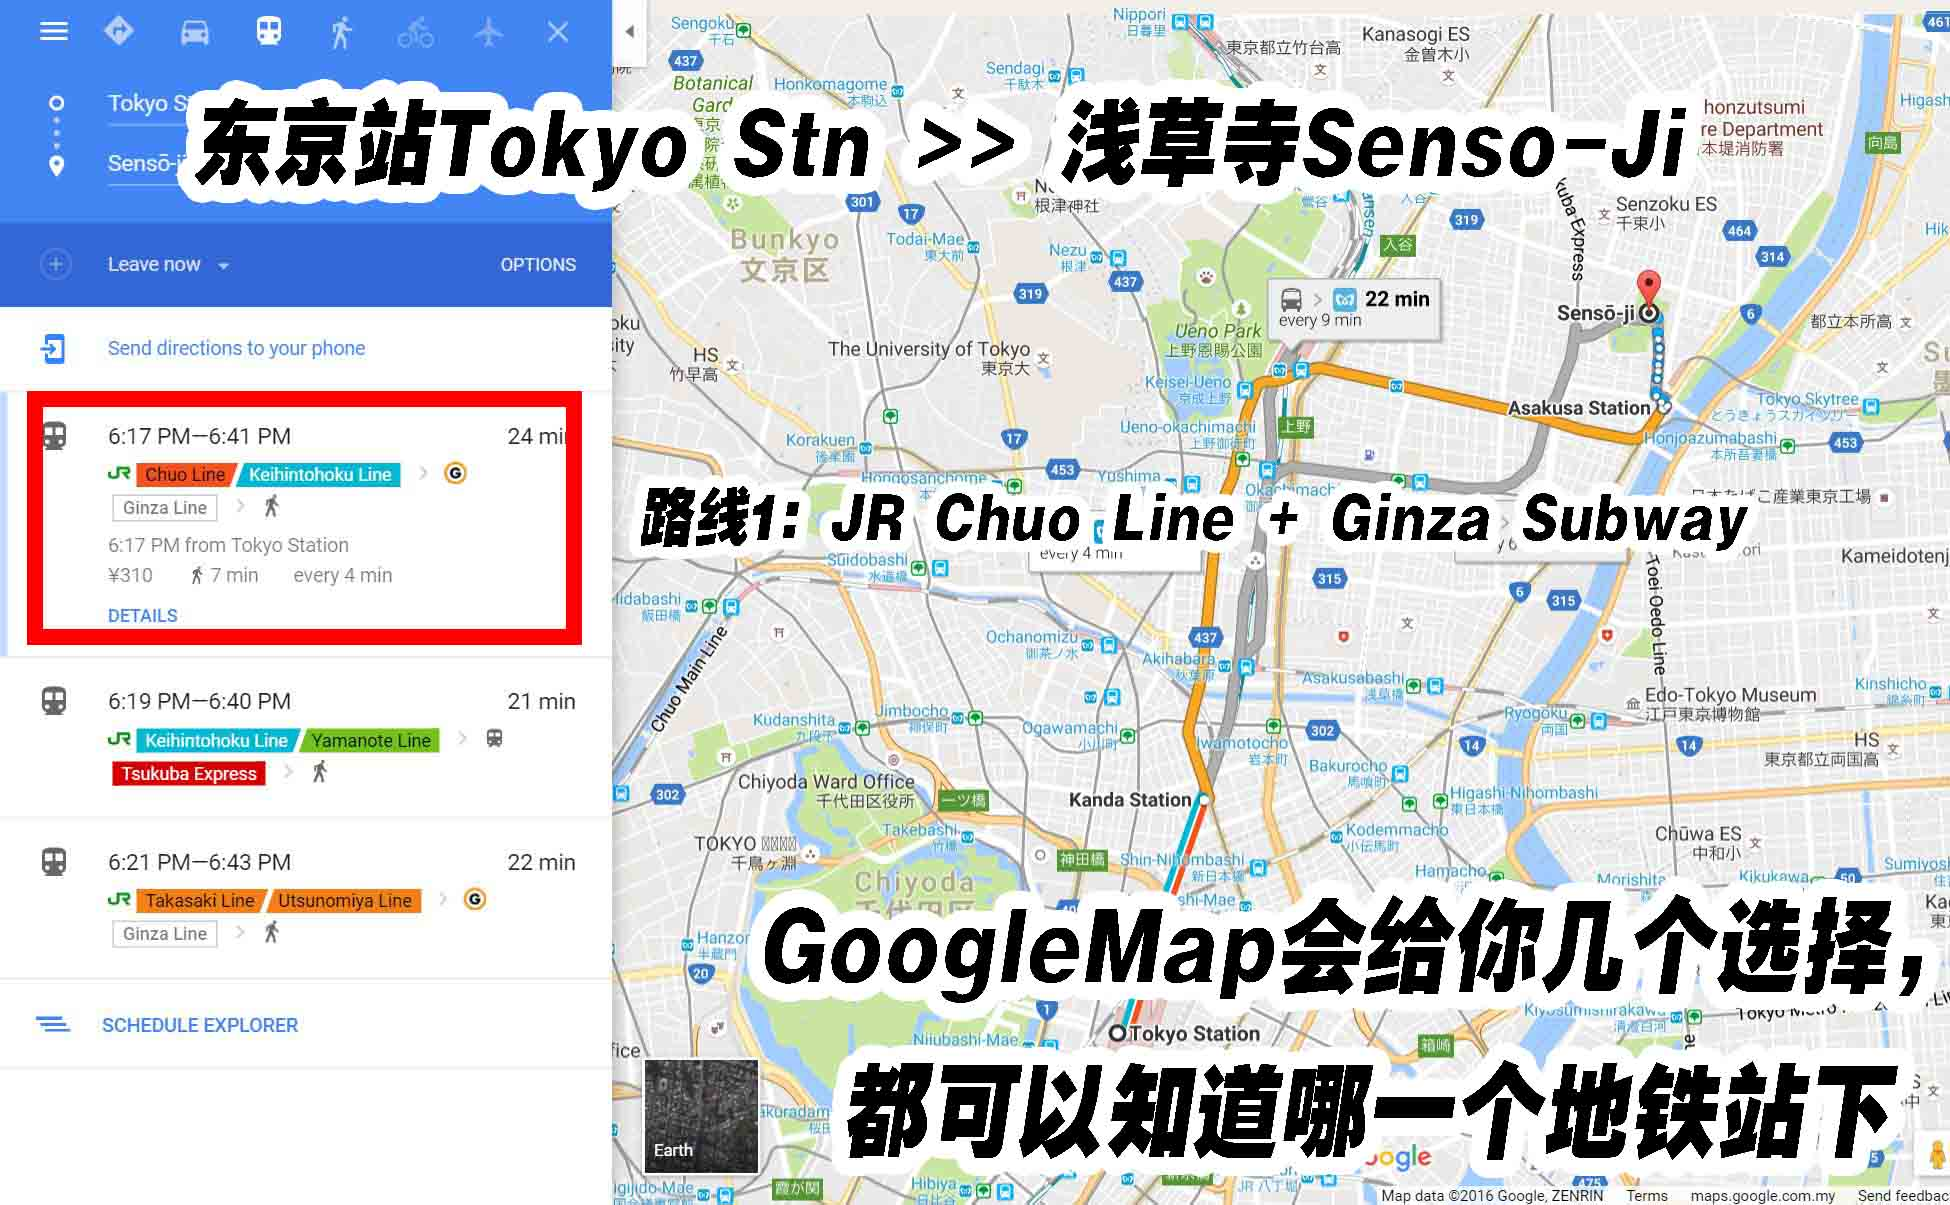 Google Map规划2